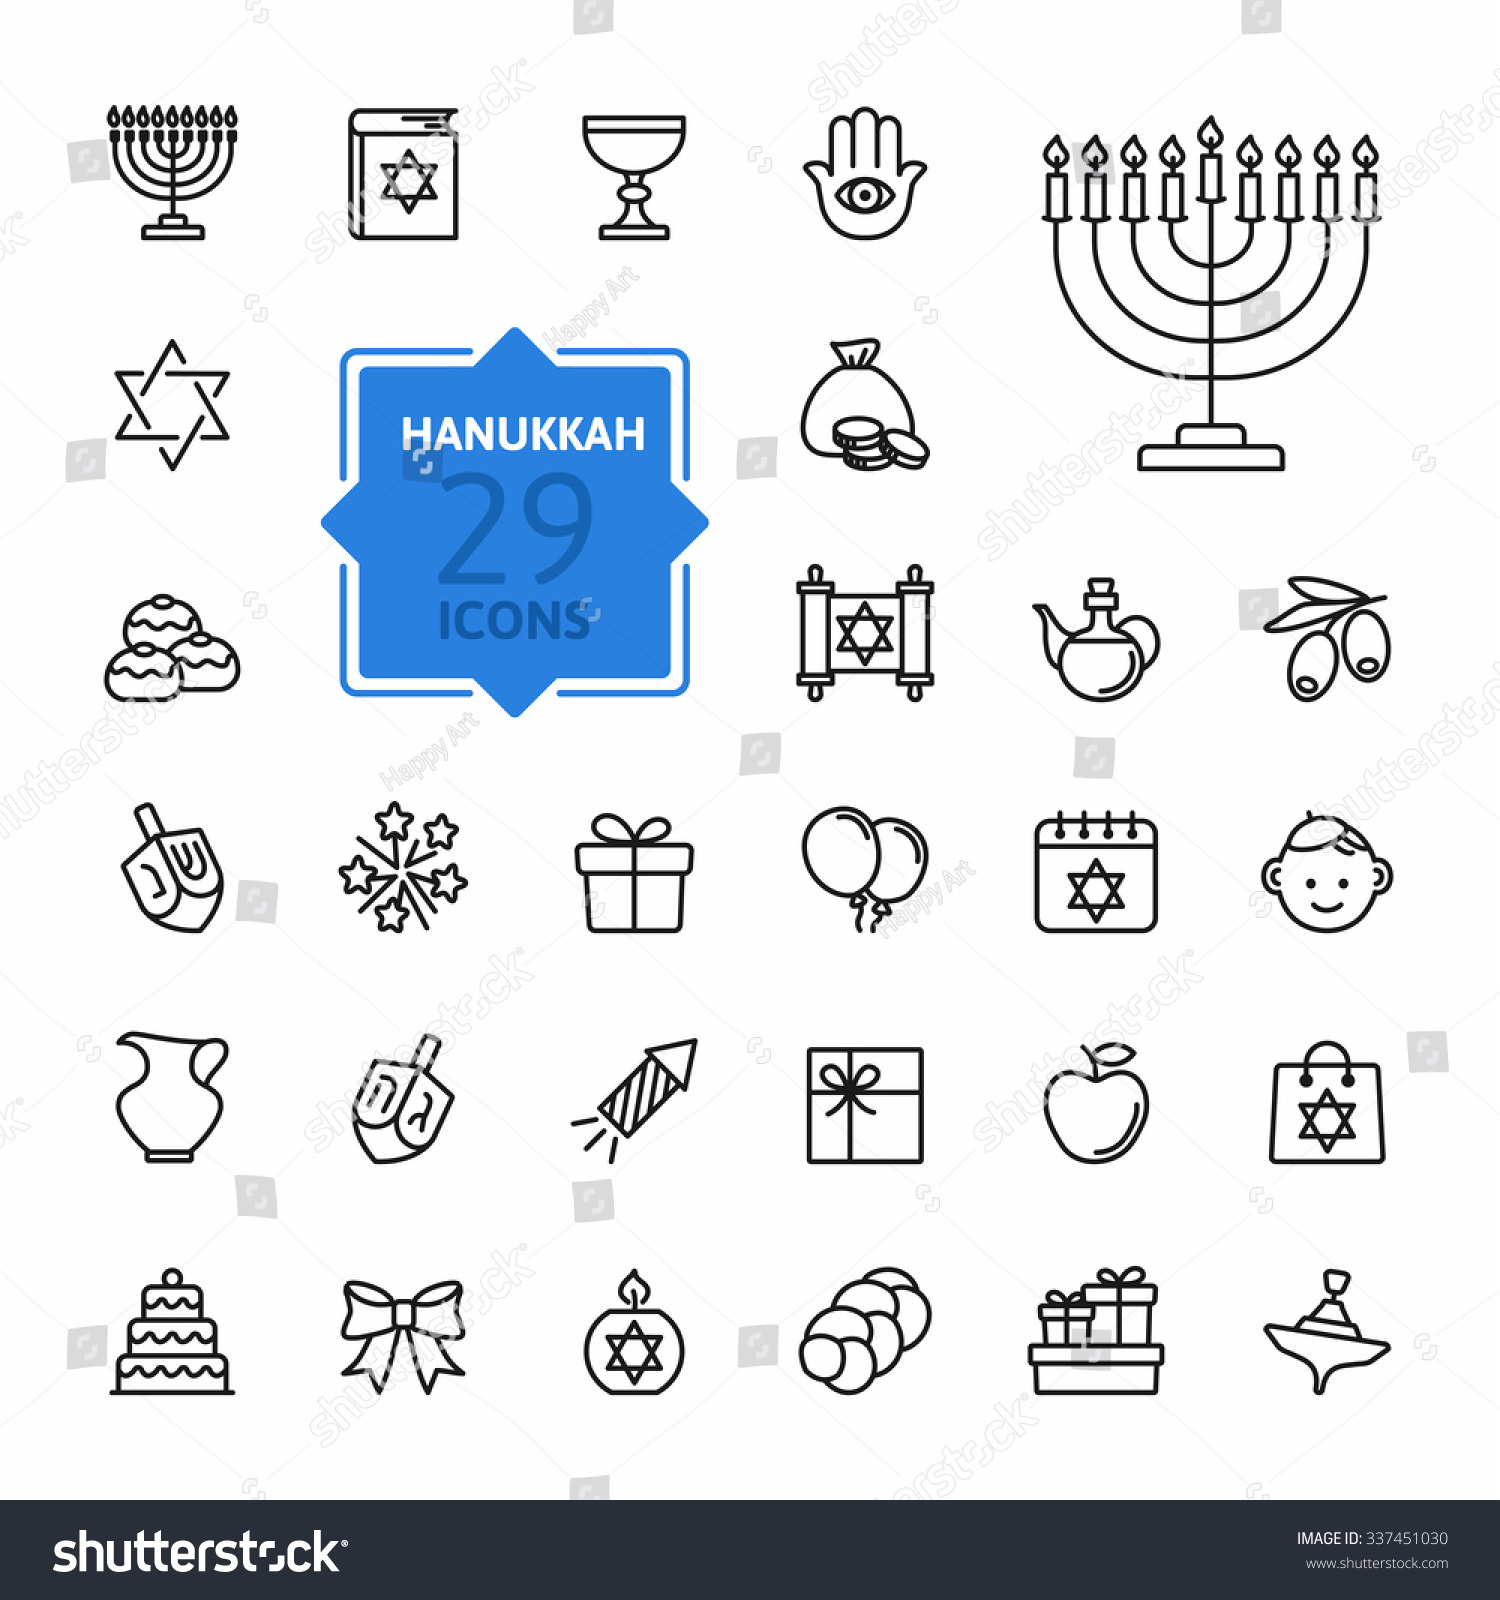 Outline icon collection symbols hanukkah stock vector 337451030 outline icon collection symbols of hanukkah biocorpaavc